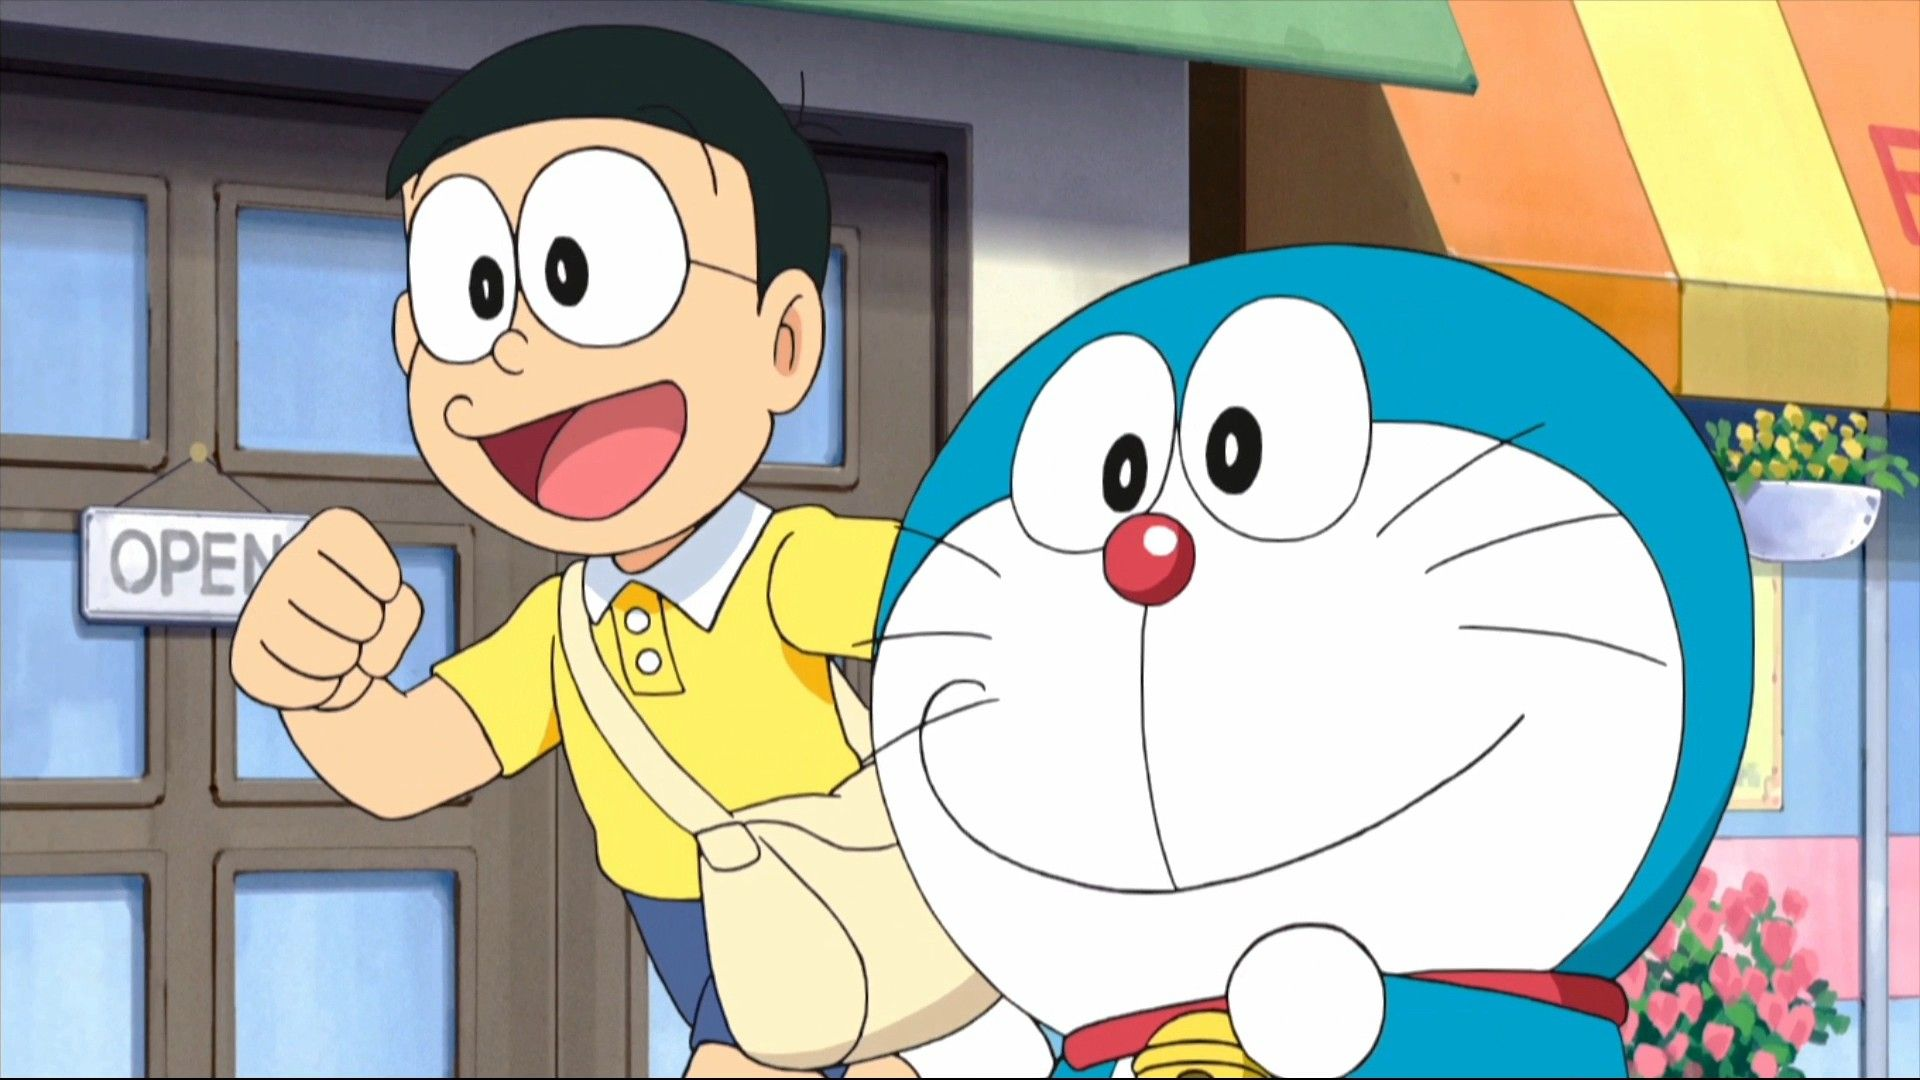 Full Hd Doraemon Nobita Nobi Full Hd Nobita Wallpaper Doraemon In 2021 Doraemon Cute Cartoon Wallpapers Doraemon Wallpapers Doraemon nobita wallpaper images